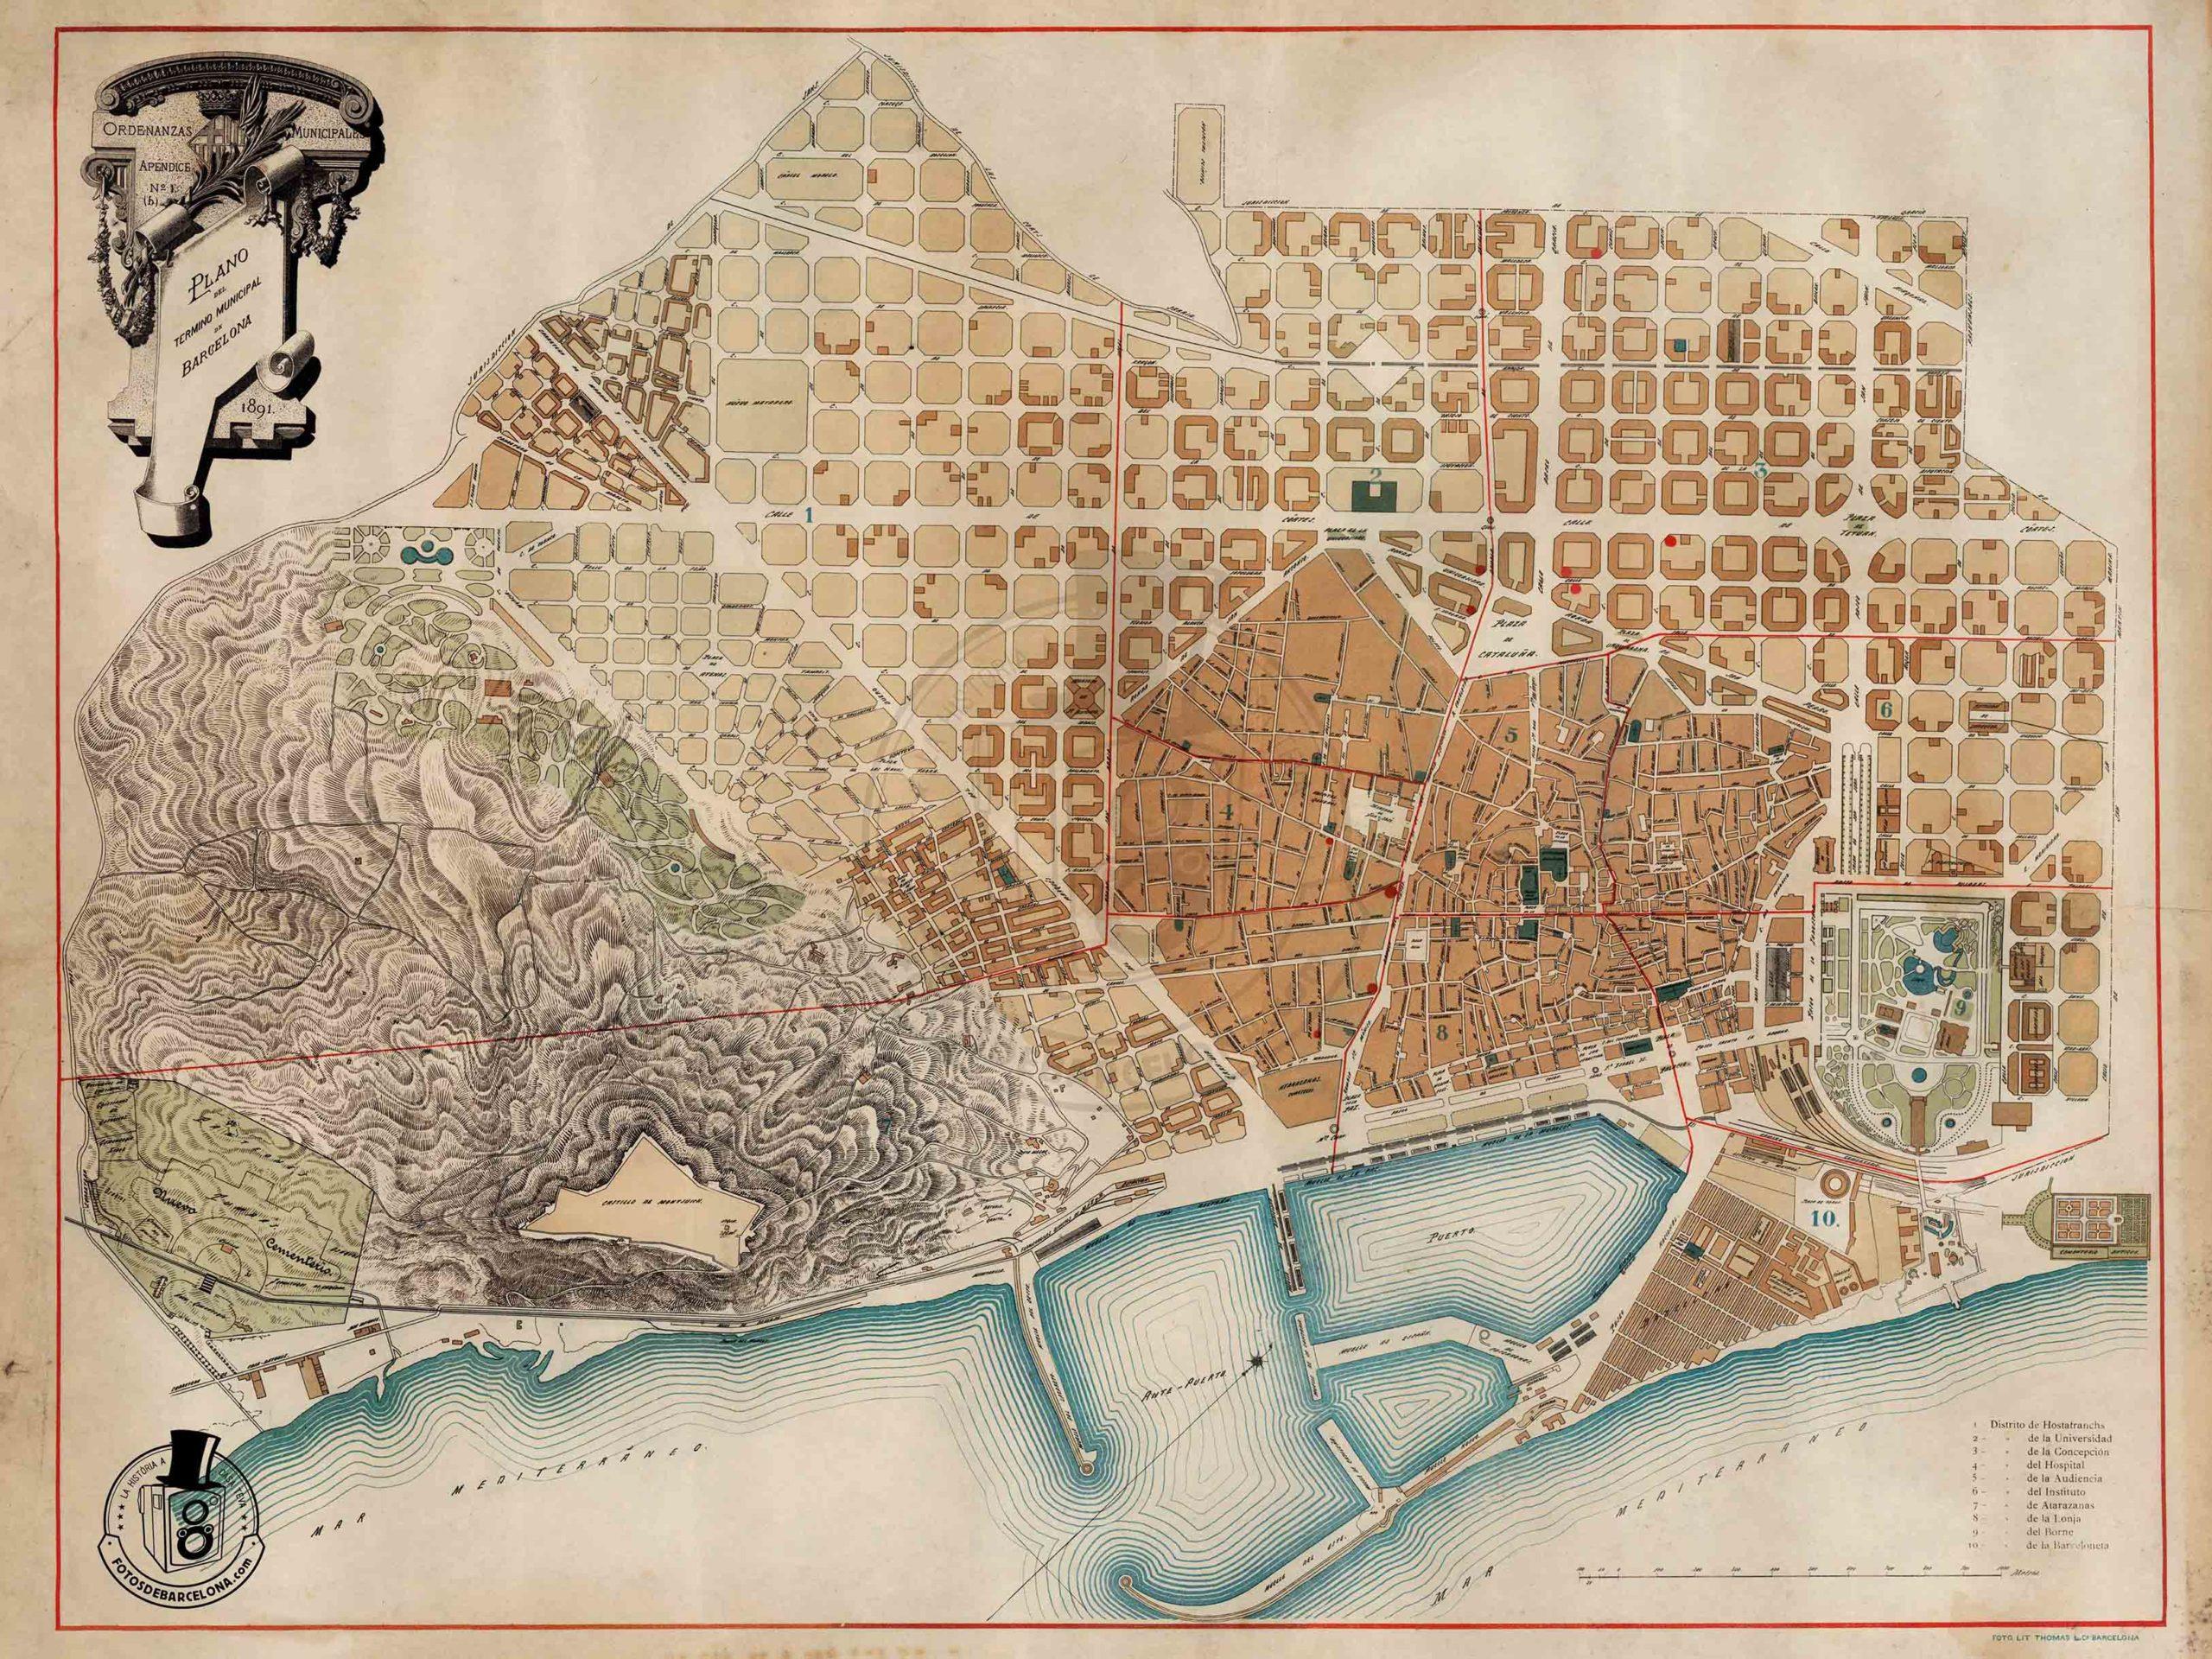 Plano de Barcelona 1891